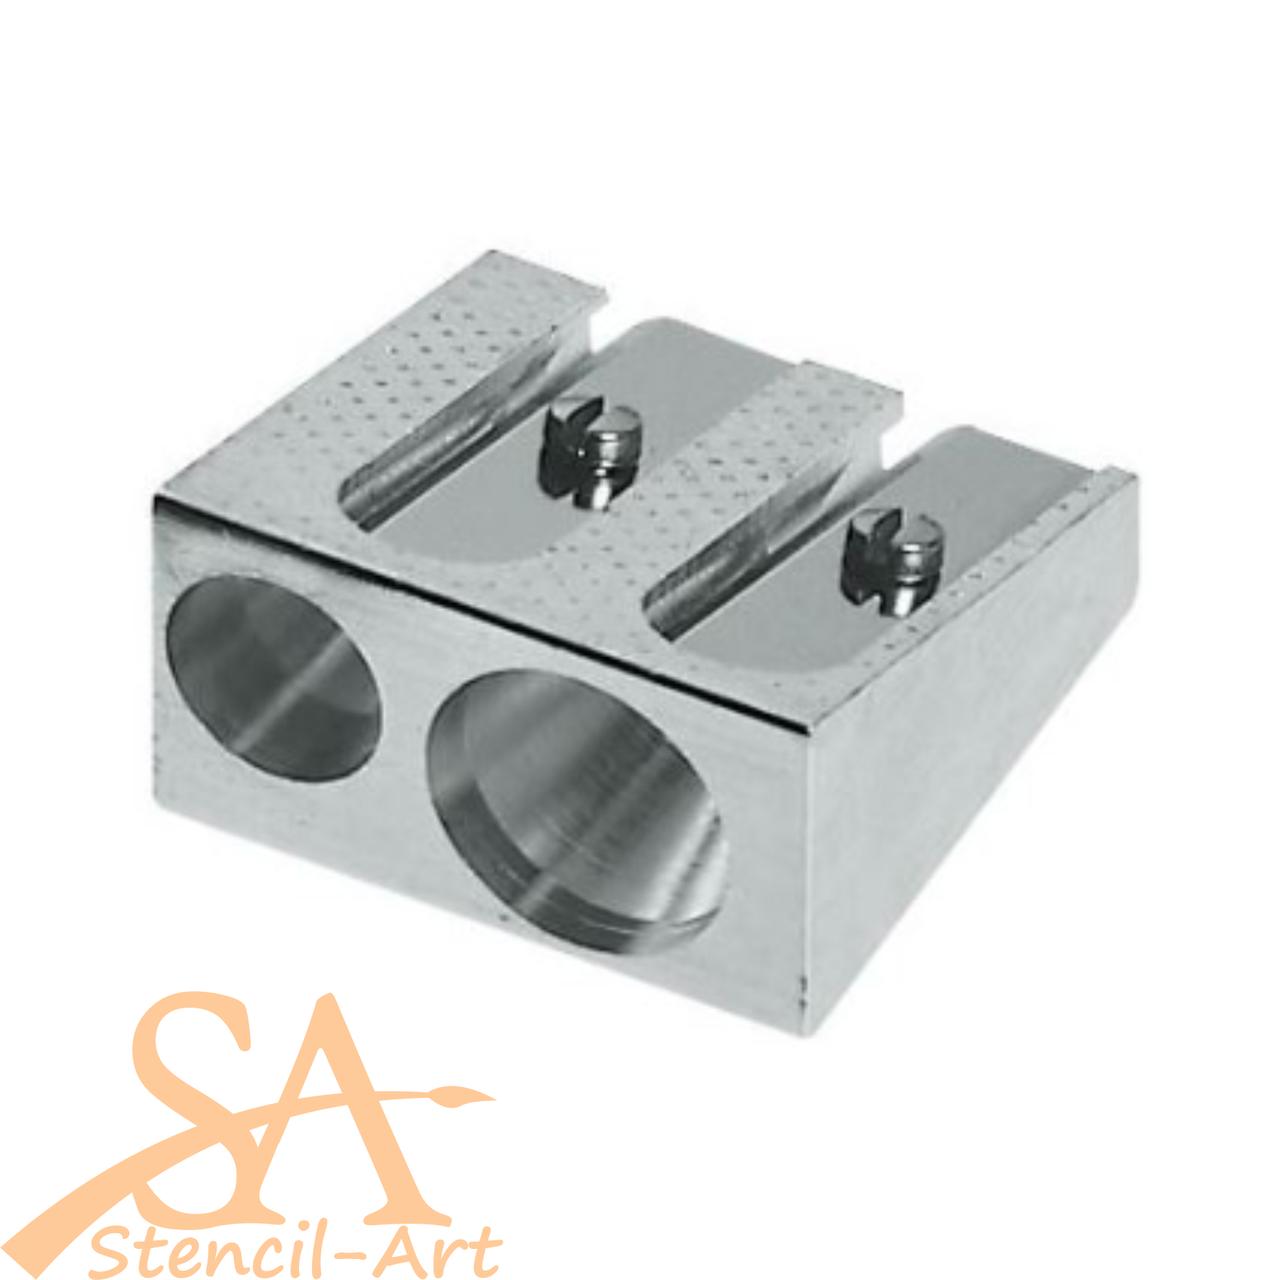 Faber-Castell Metal Pencil Sharpener Dual Hole